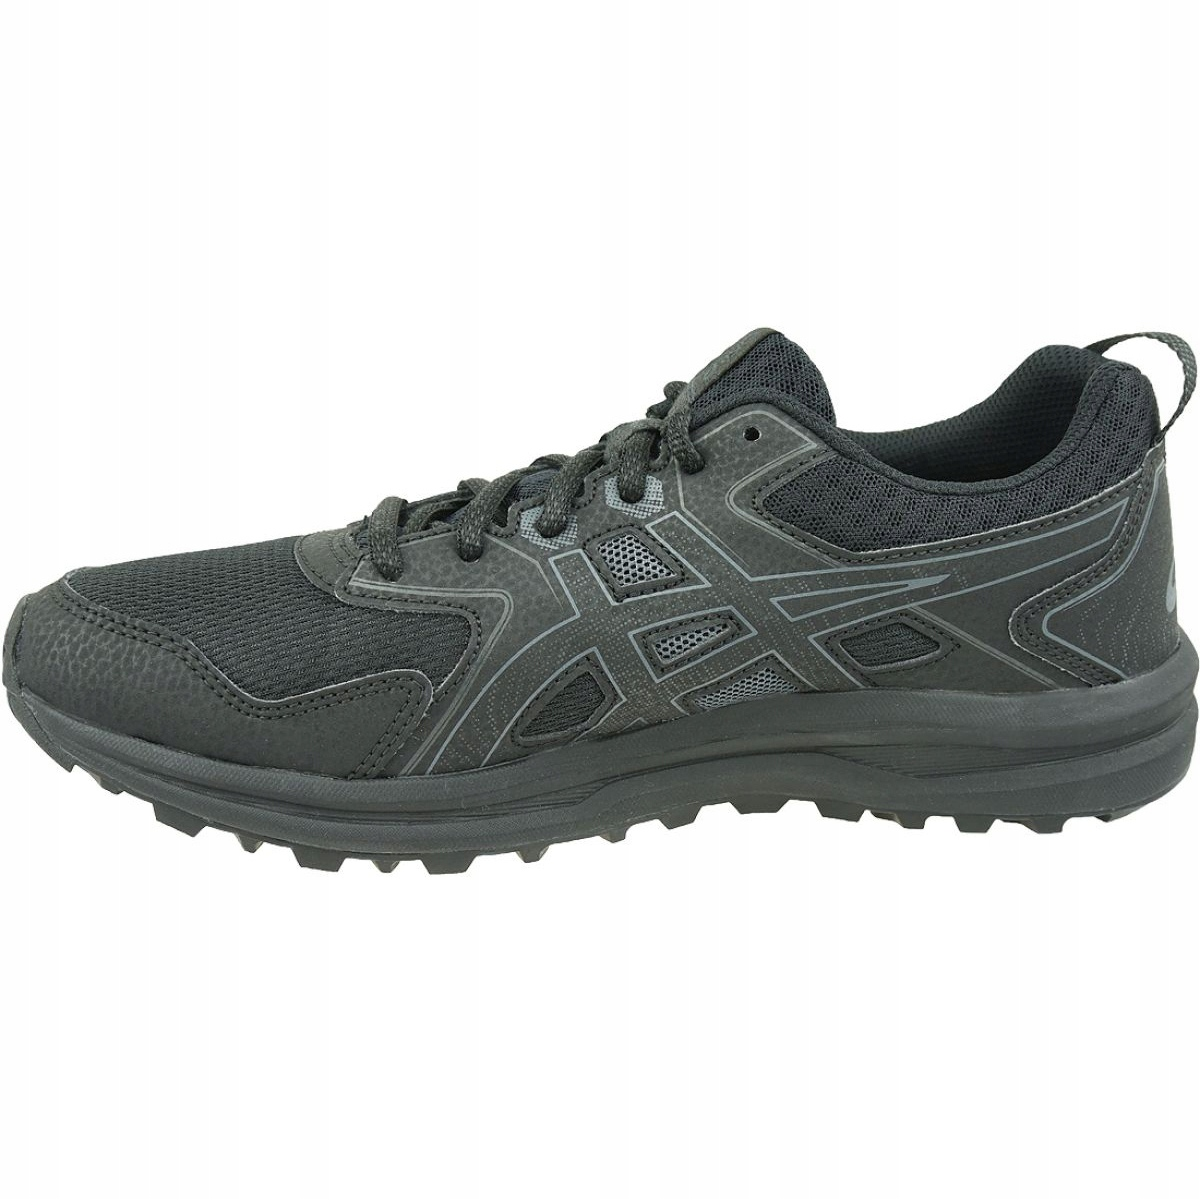 Schuhe ASICS Trail Scout 1012A566 BlackCarrier Grey 001